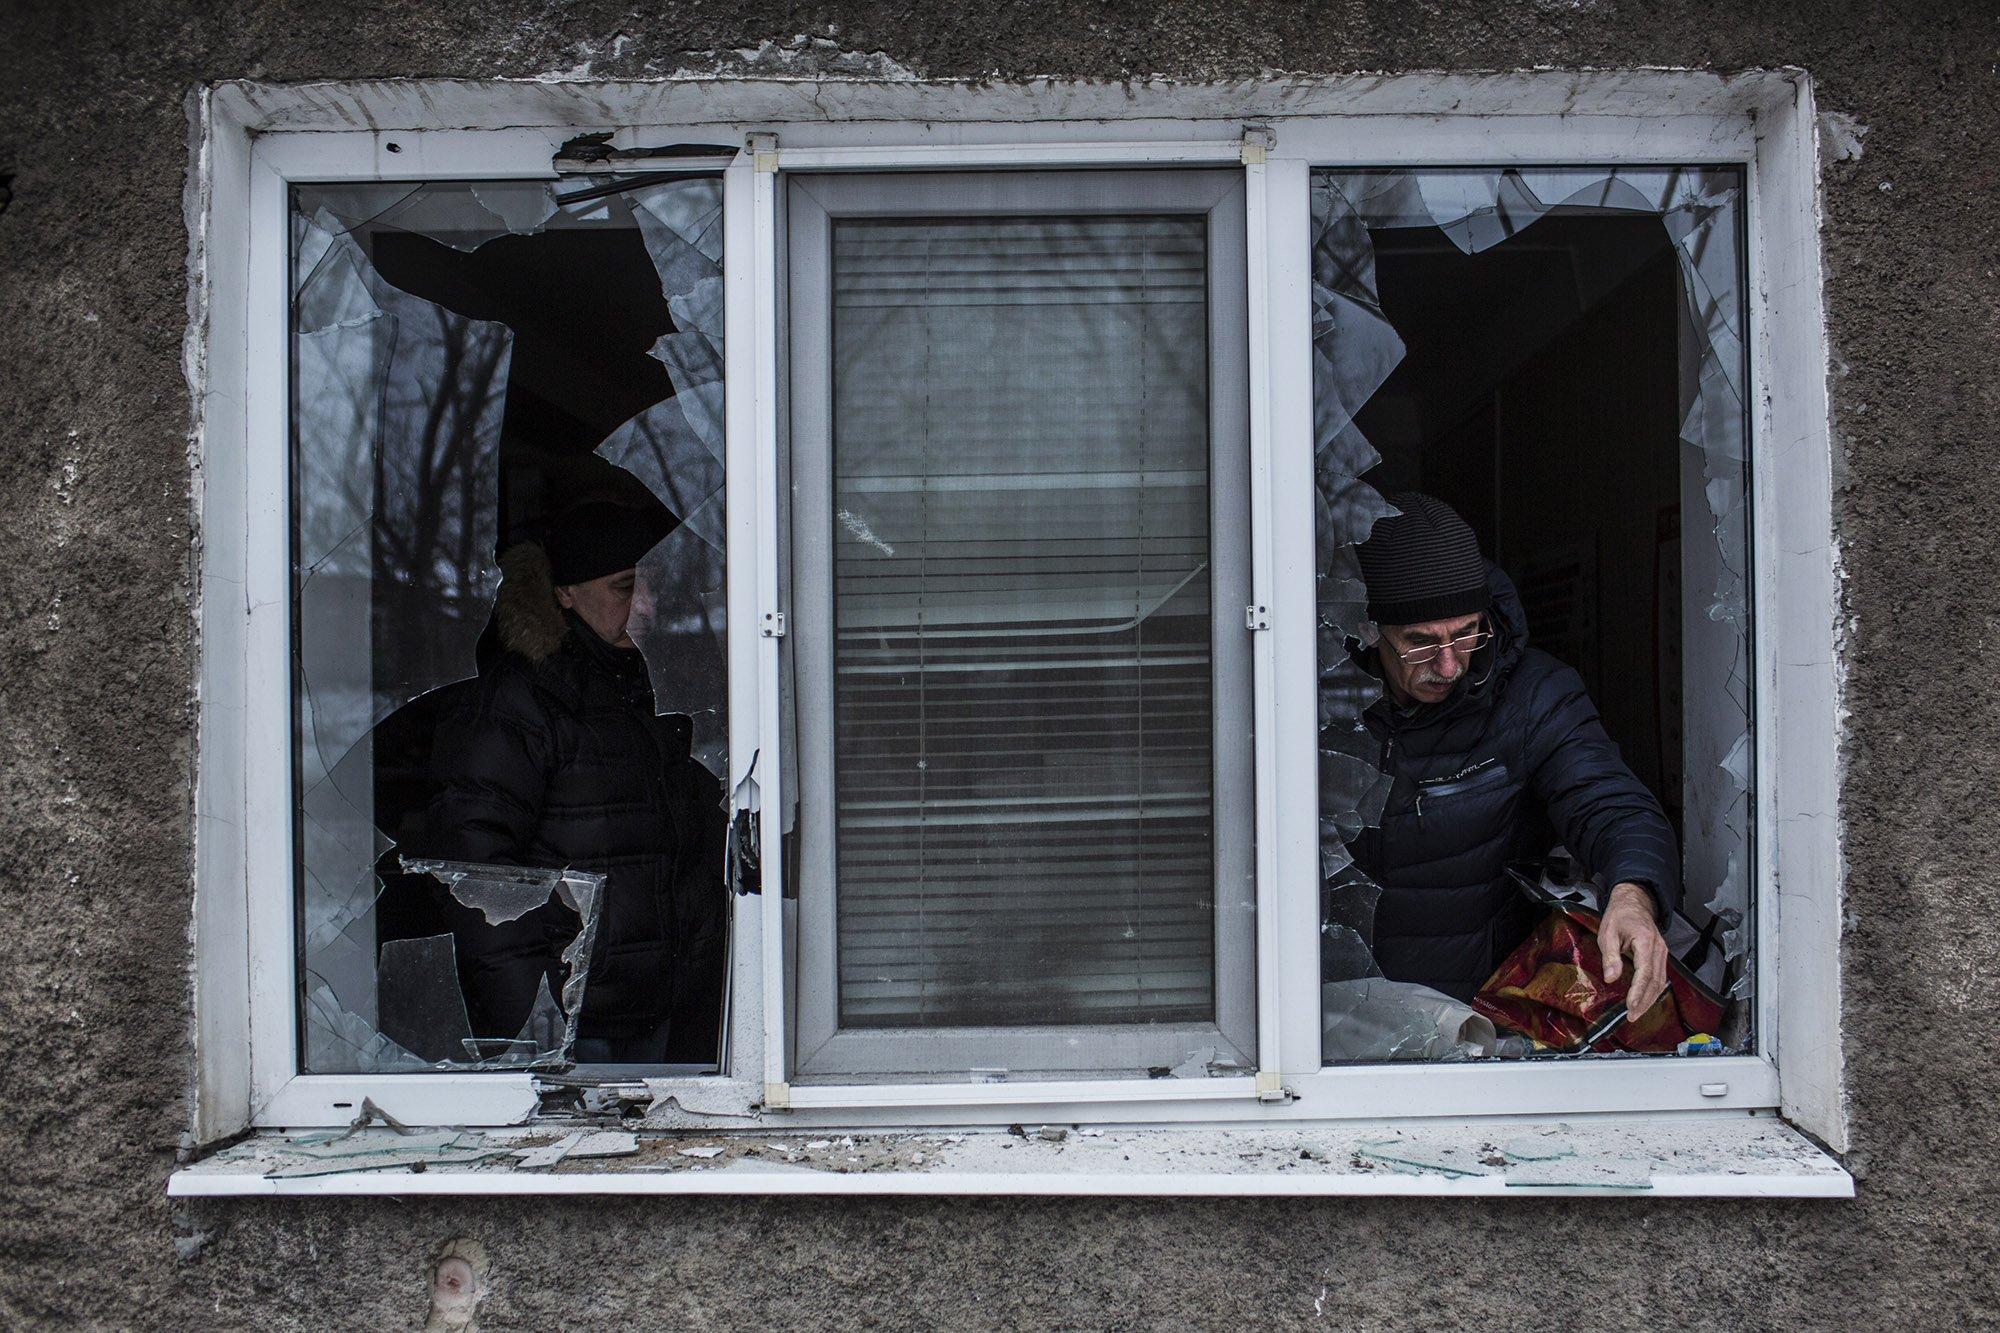 Destroyed house in Ilovaisk, Donetsk region, Ukraine. Photo: Corinne Baker